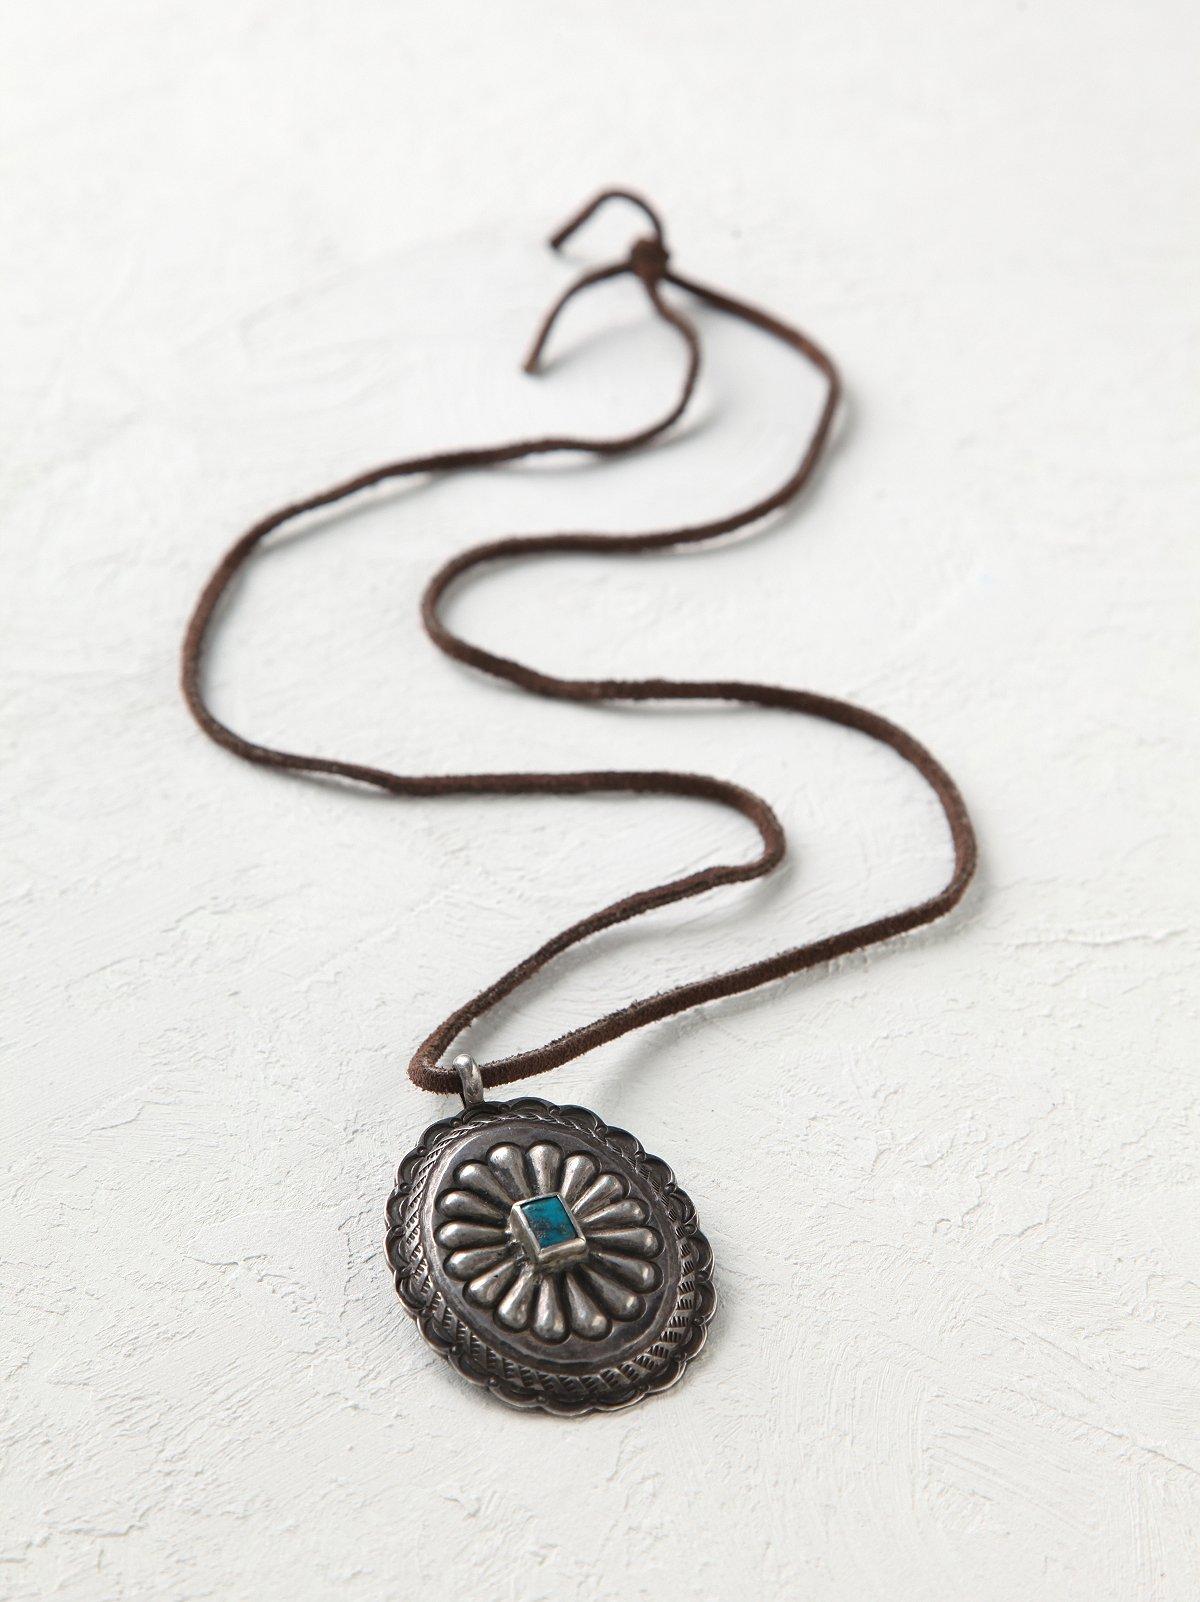 Vintage Silver Turquoise Pendant